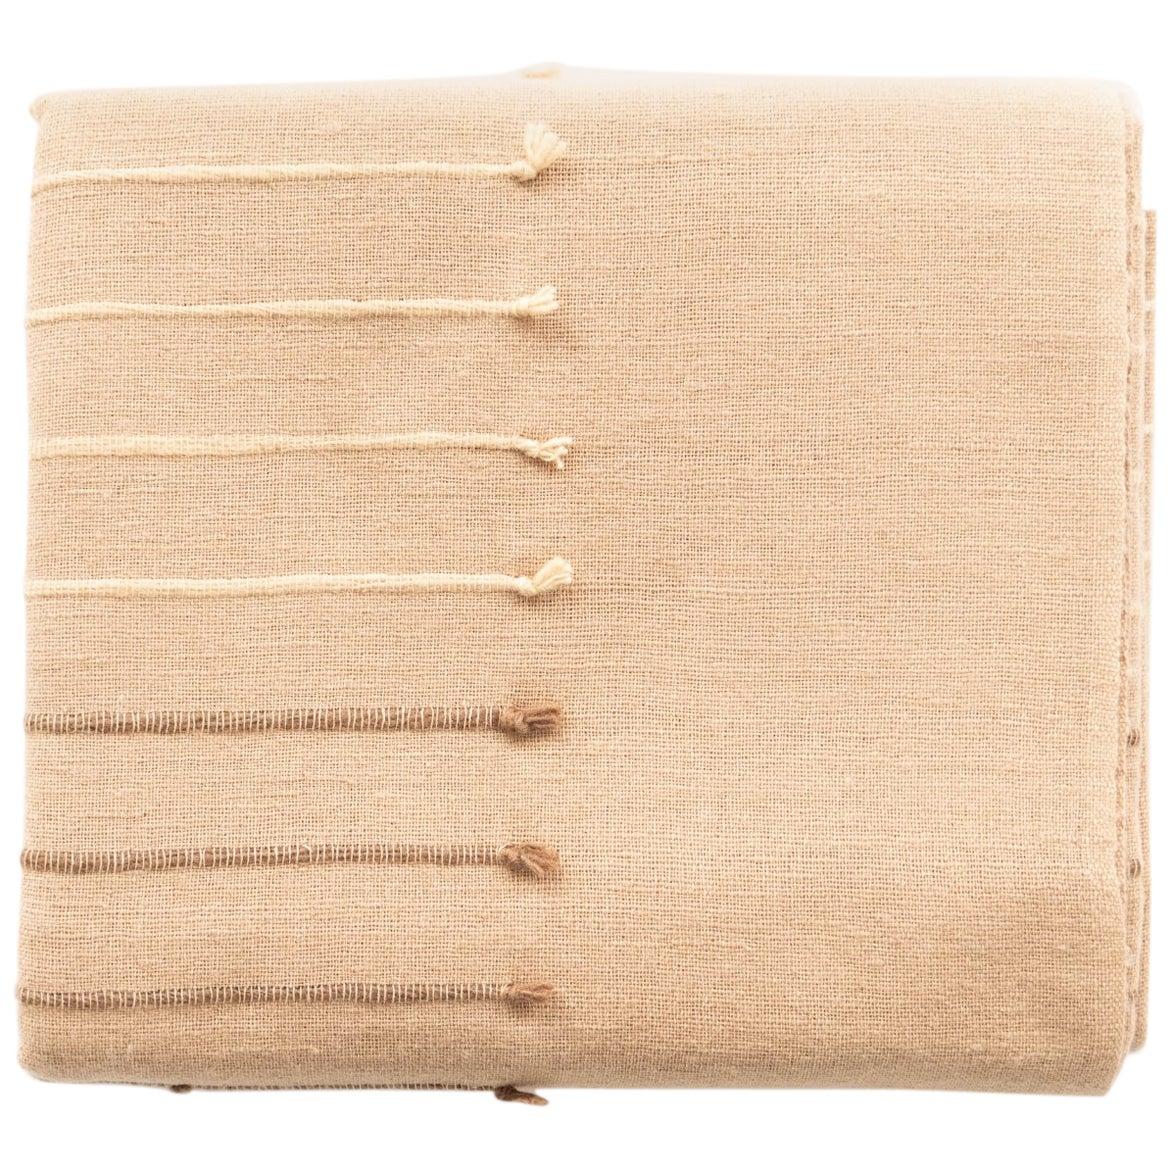 TERRA Handloom Merino Cotton Throw /  Blanket In Stripes Design, Neutral Color